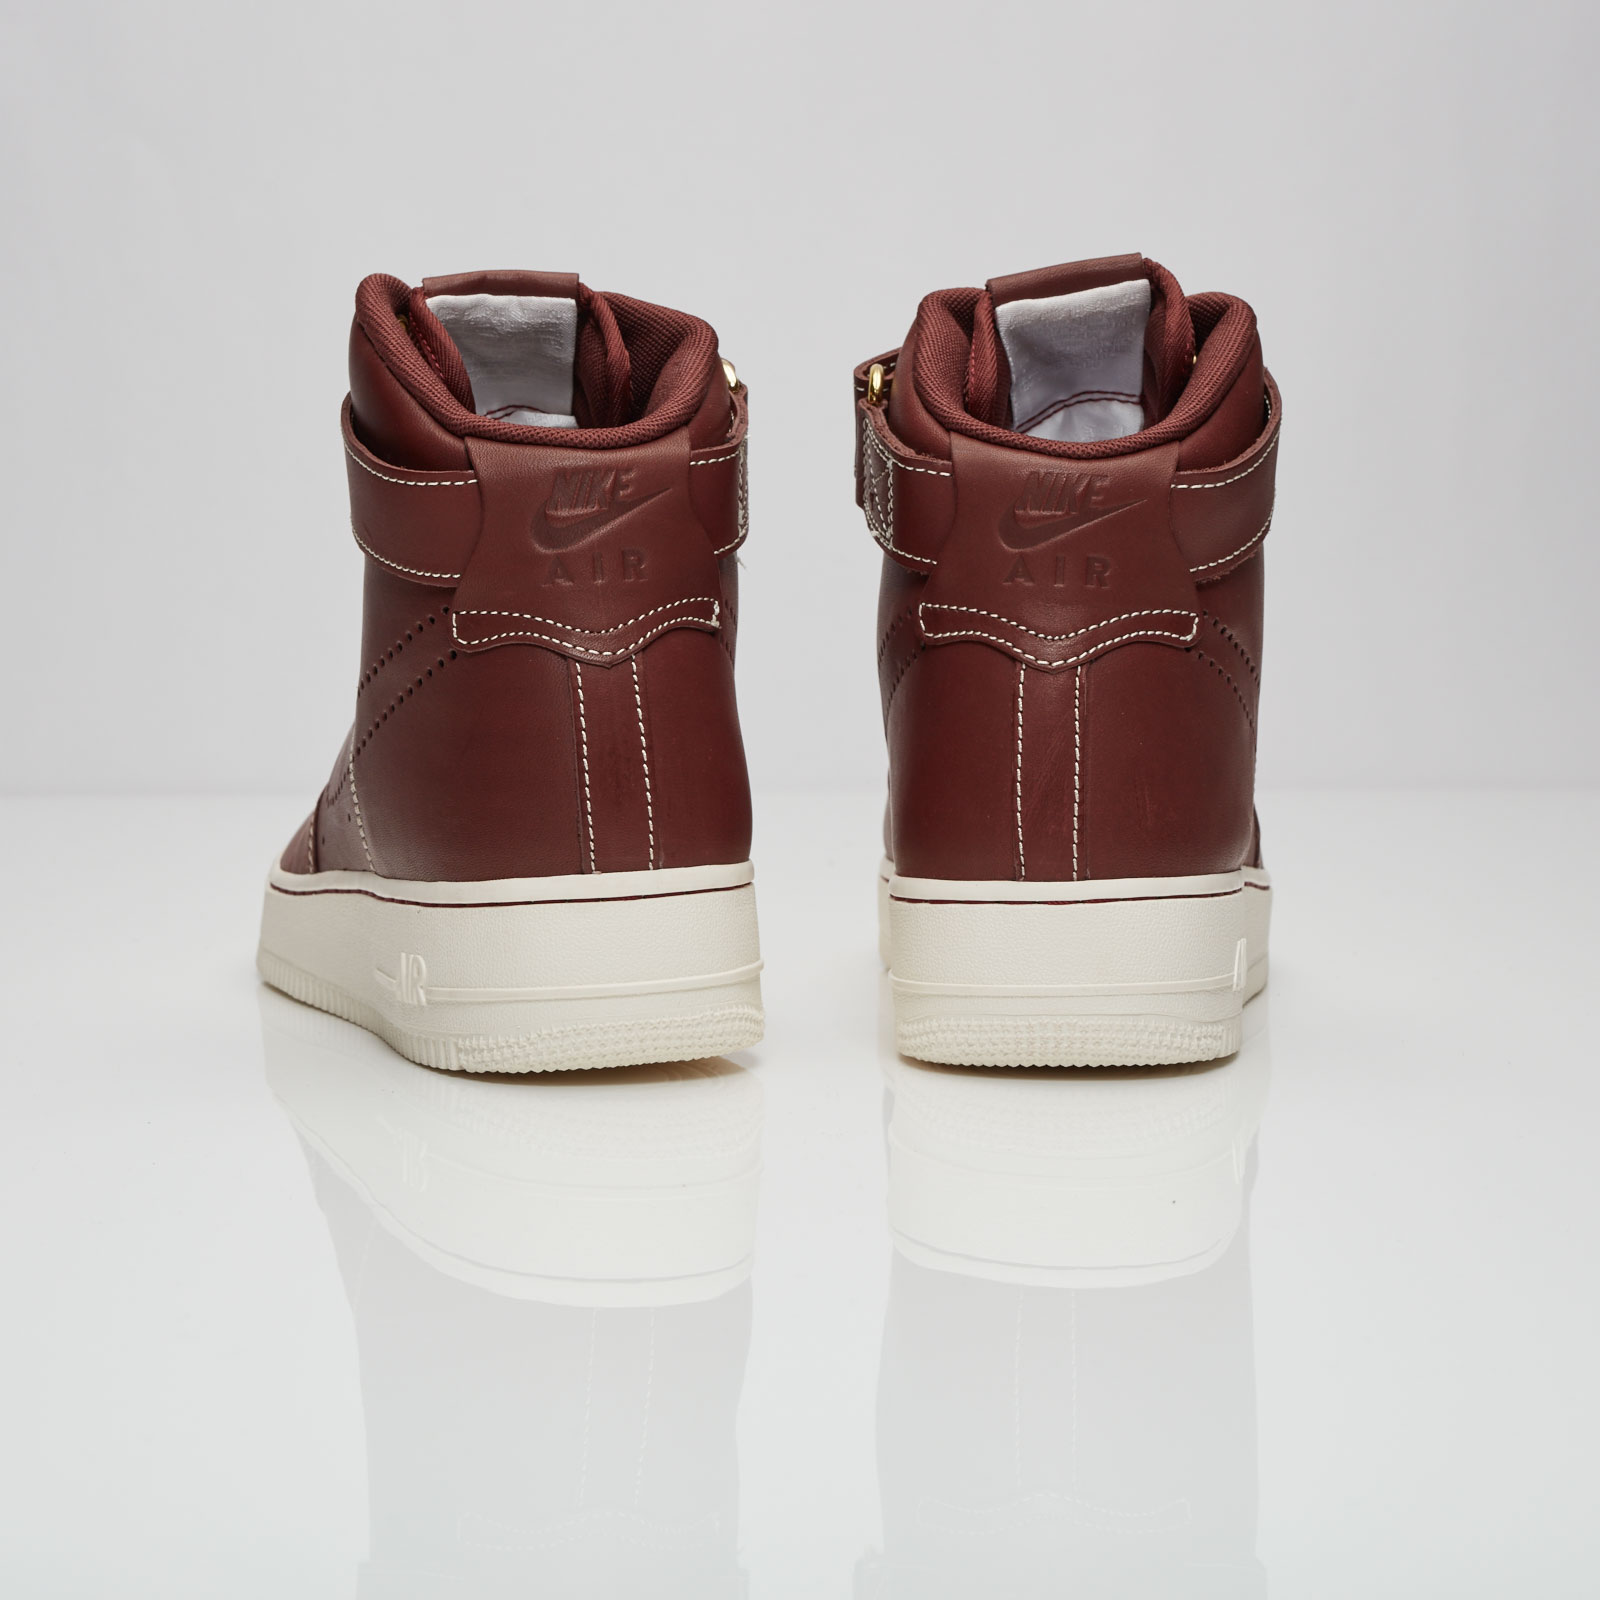 Nike Air Force 1 Hi 08 Lv8 WB 882096 600 Sneakersnstuff